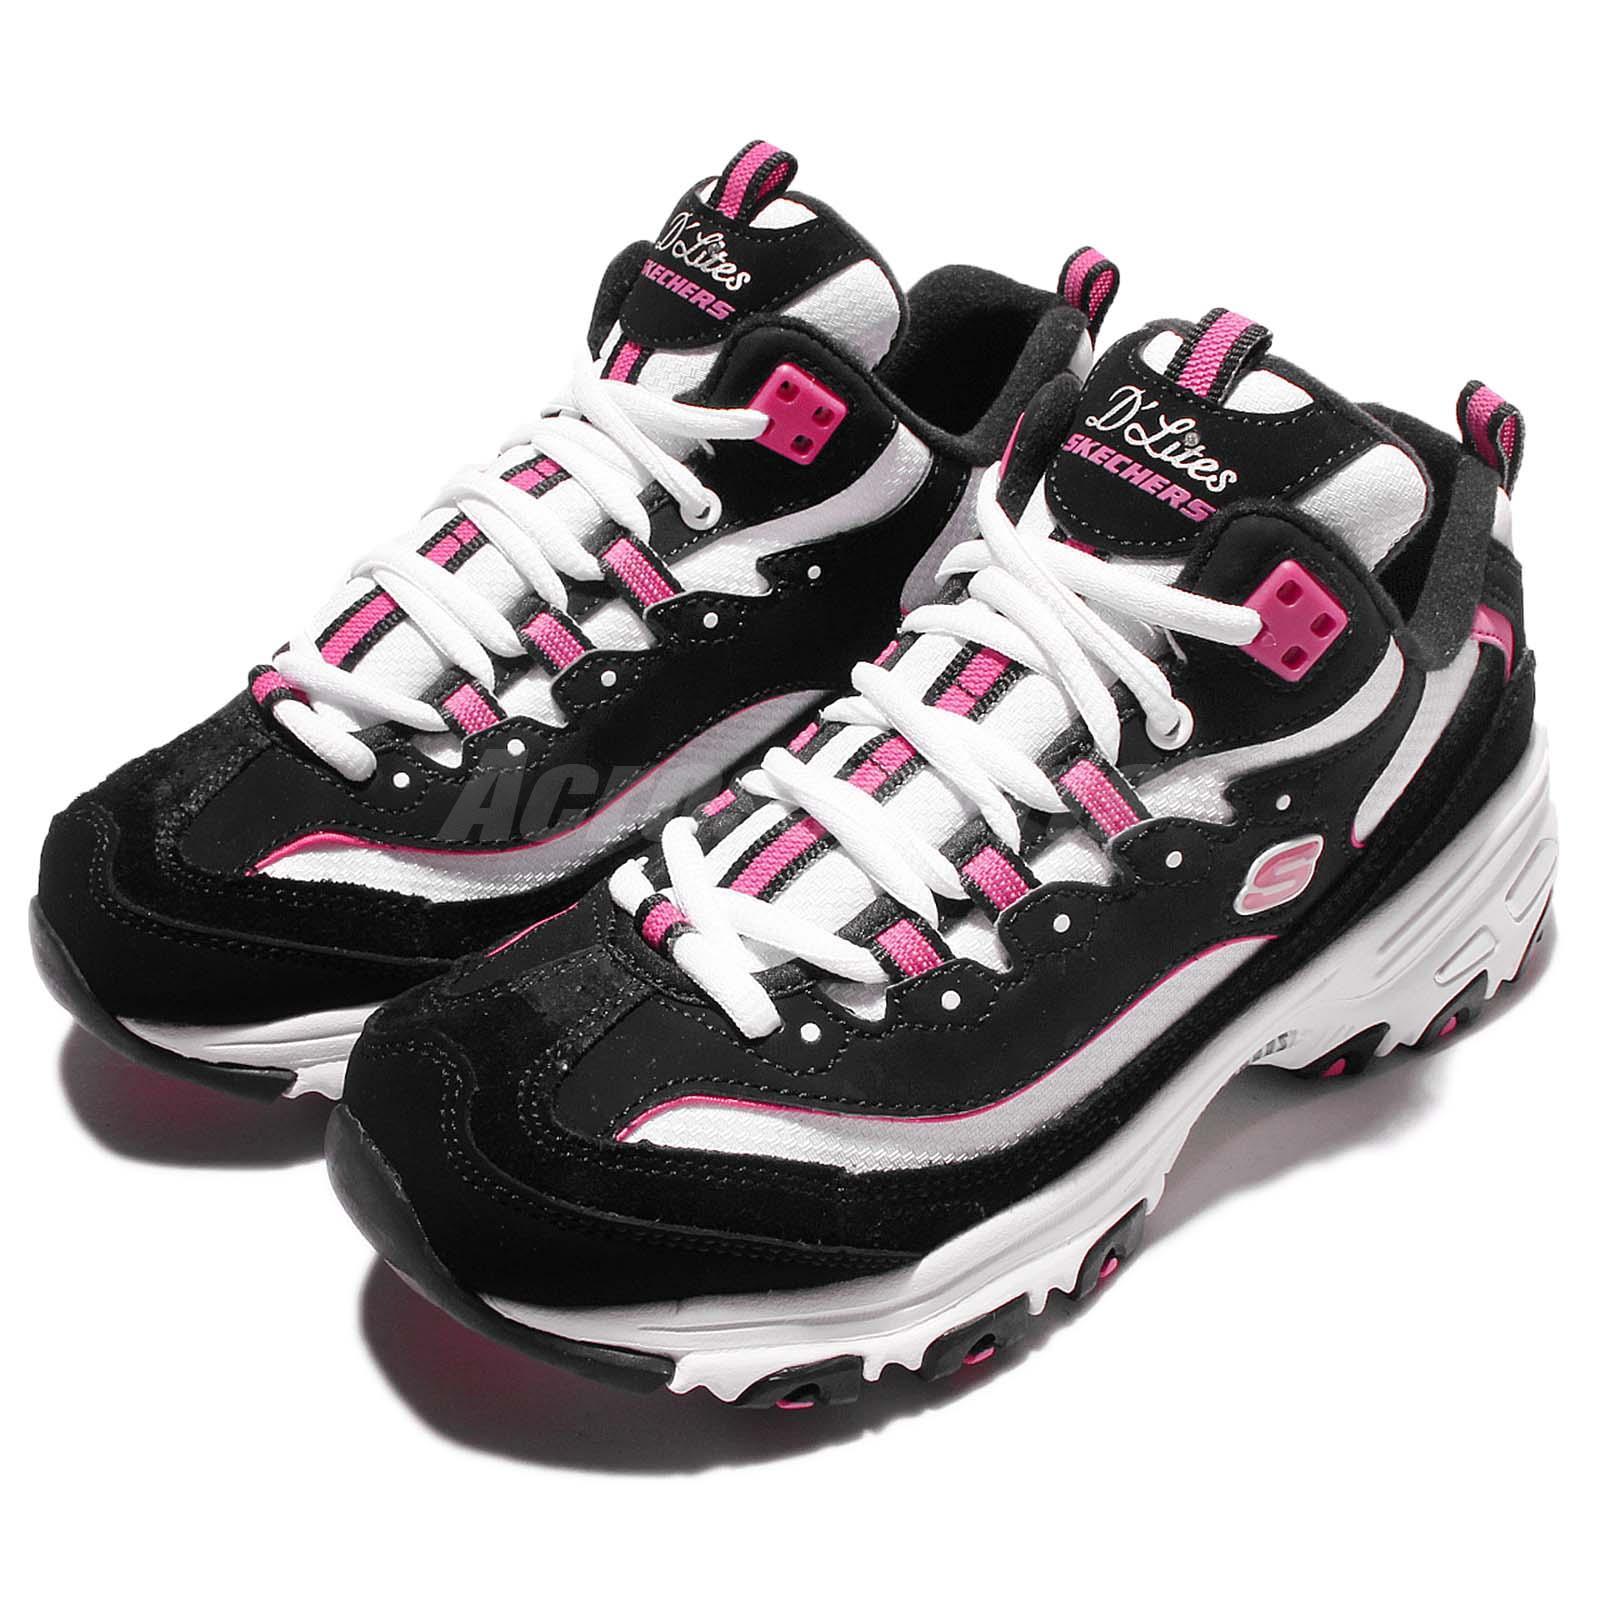 Skechers D lites D liteful Black Pink Womens Running Shoes ...